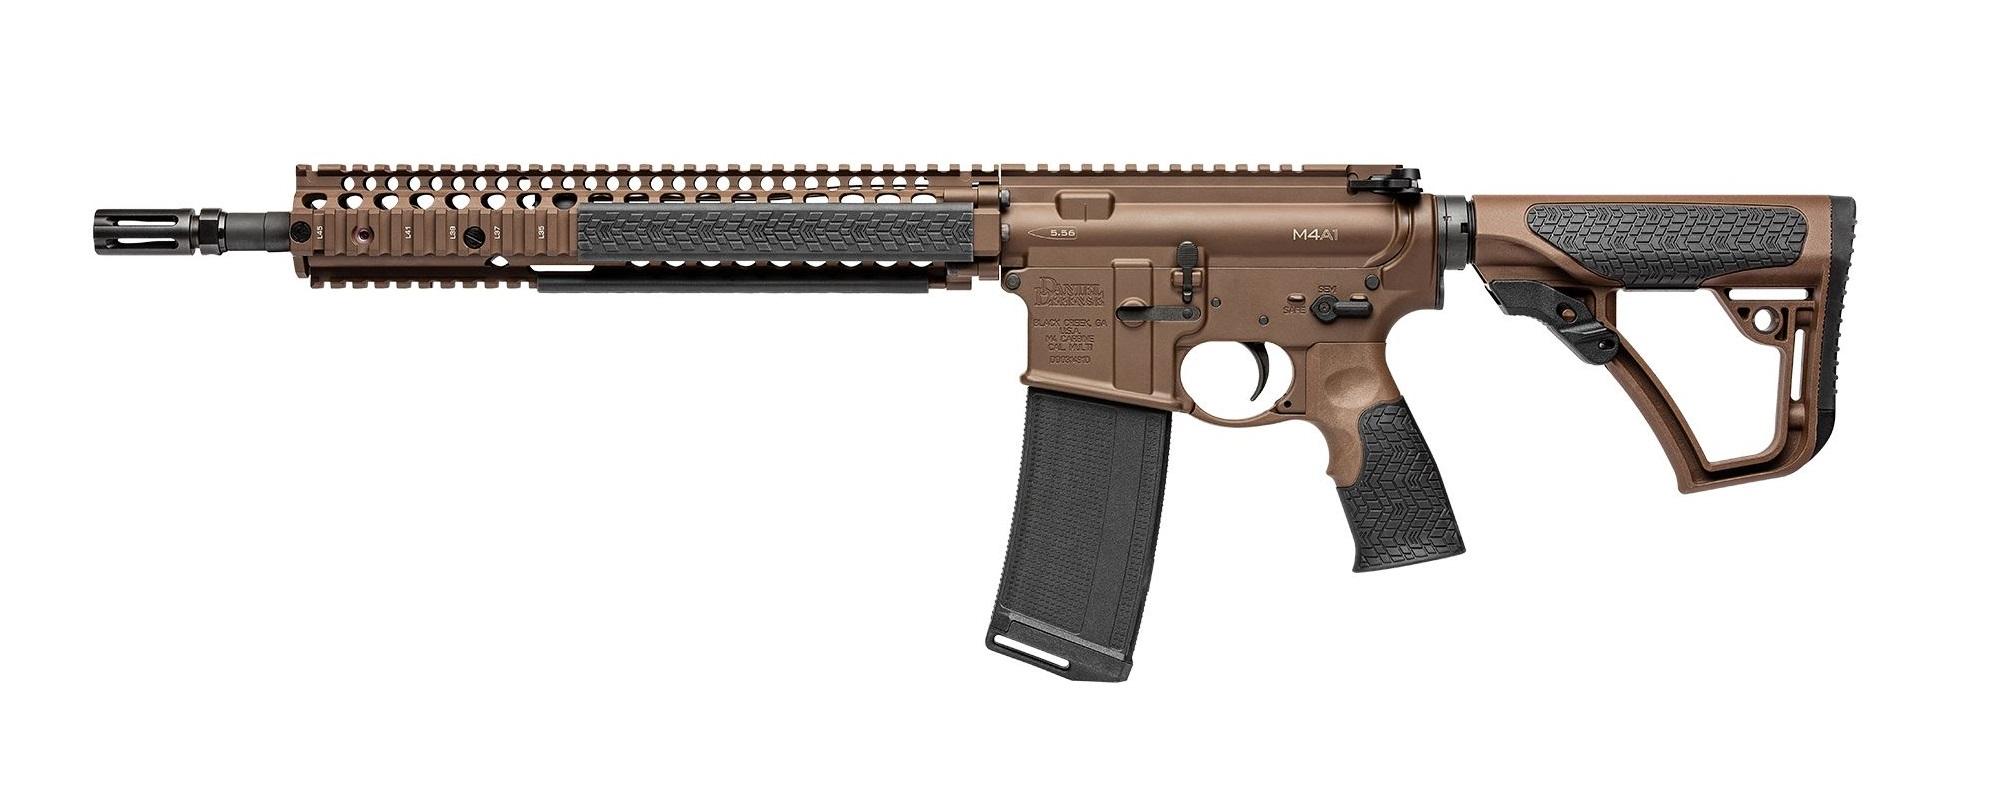 Daniel Defense M4A1 223 REM   5.56 NATO